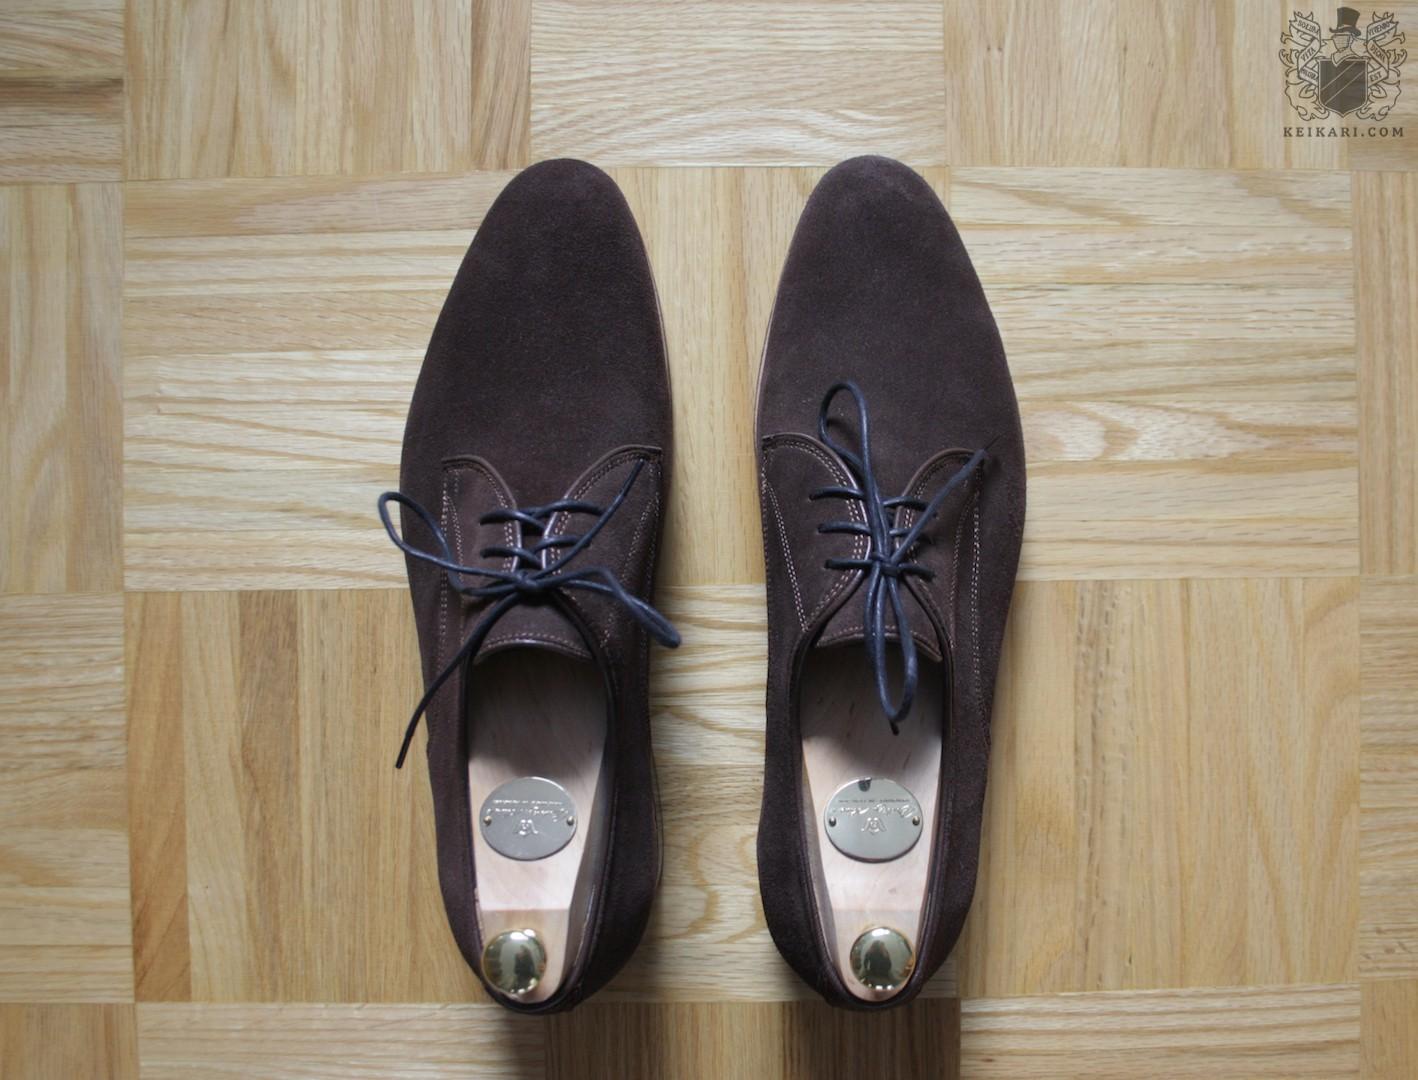 Anatomy_of_Buday_shoes_at_Keikari_dot_com12.jpg